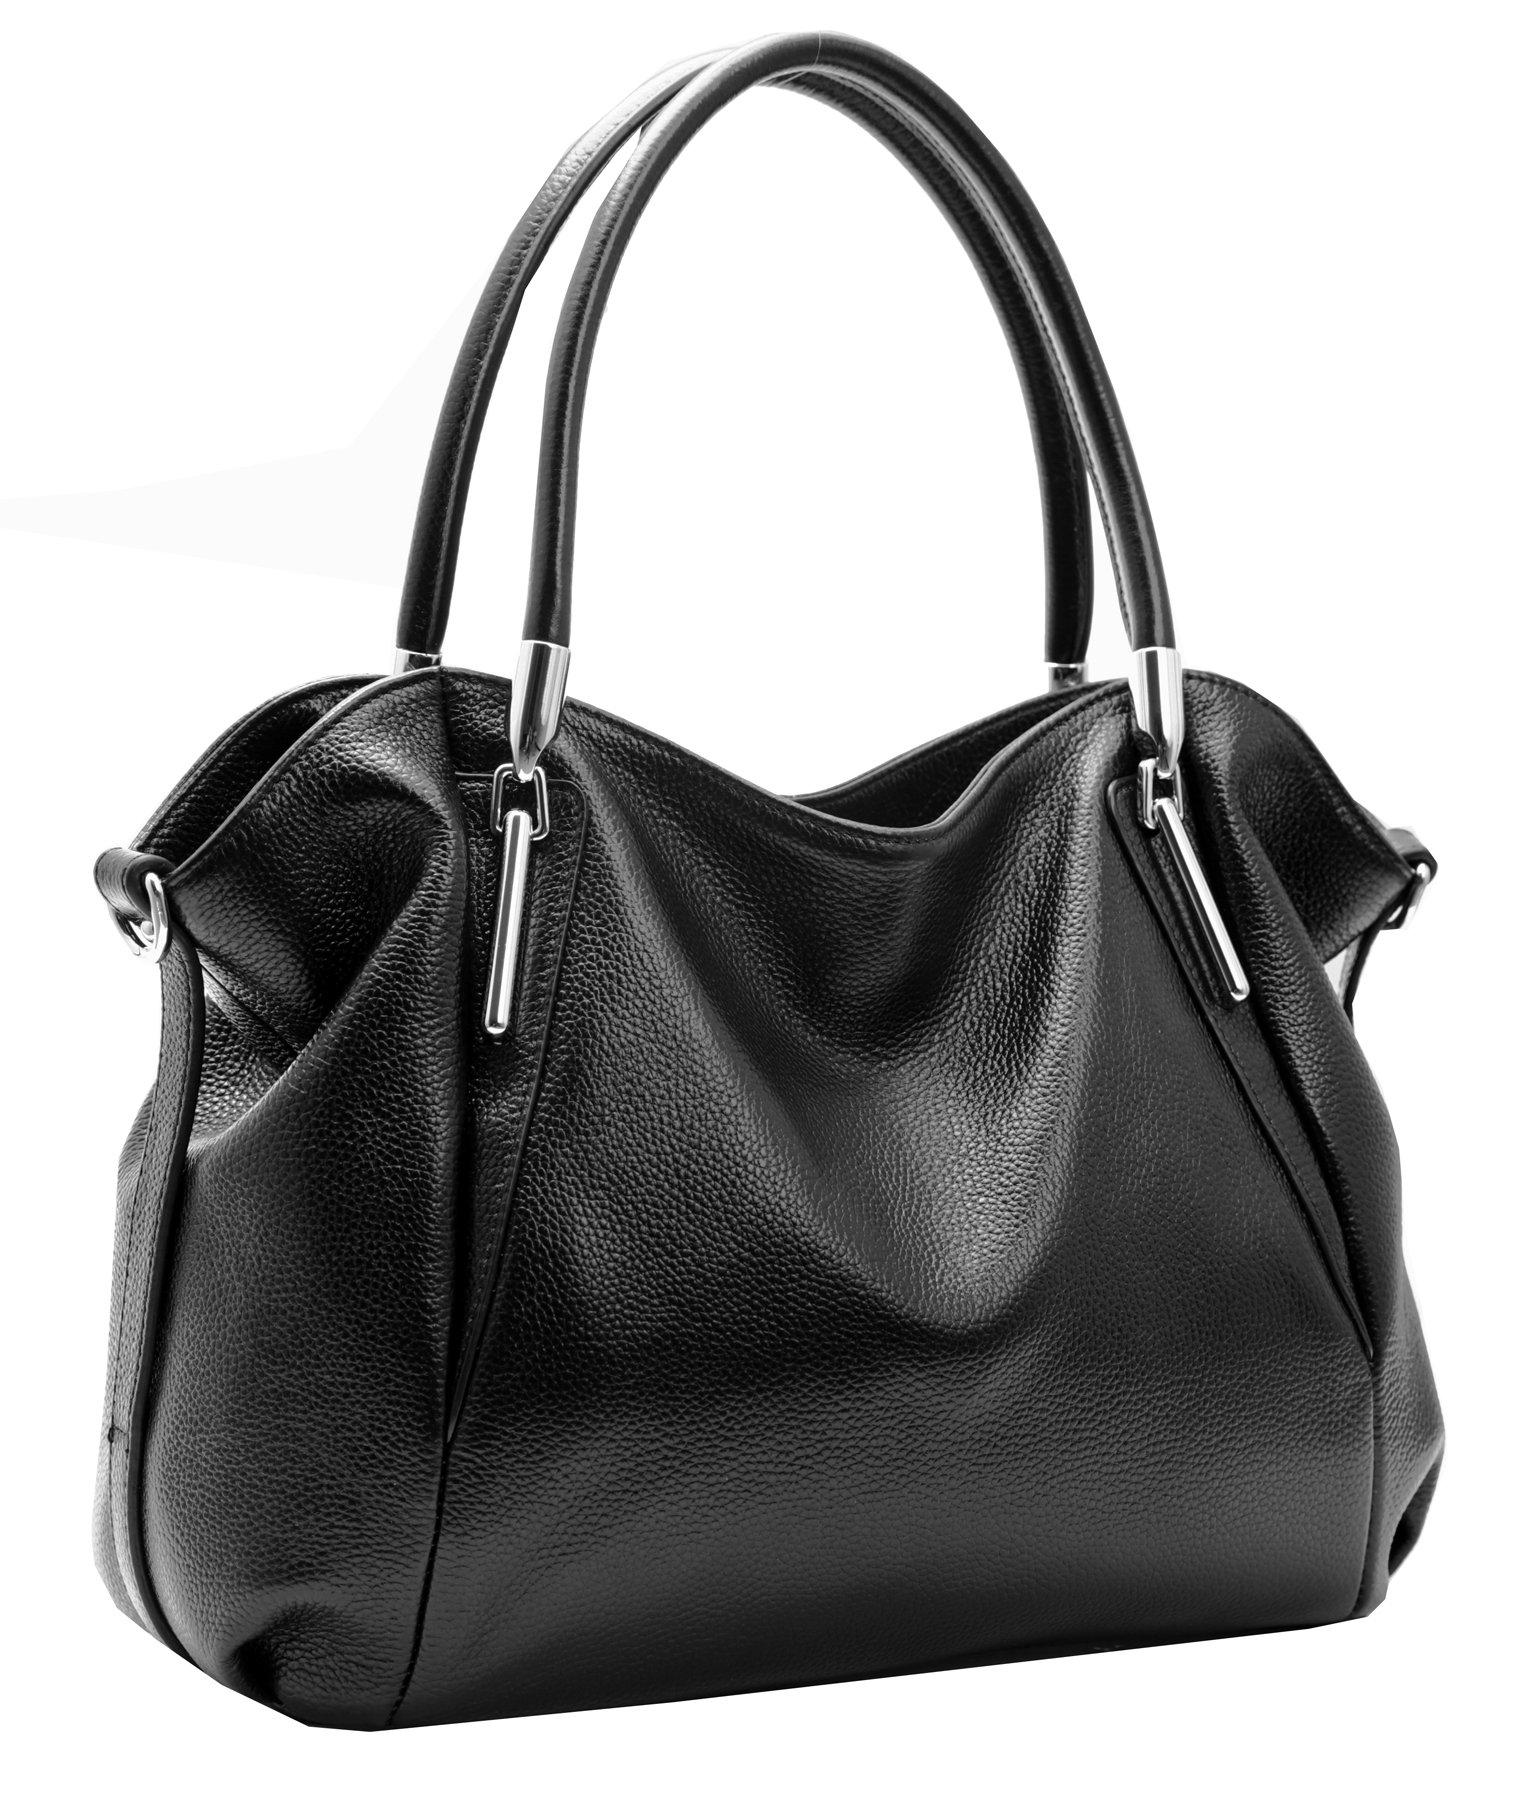 Heshe Womens Leather Handbags Tote Bag Top Handle Bag Hobo Shoulder Handbag Designer Ladies Purse Cross Body Bag (Black)